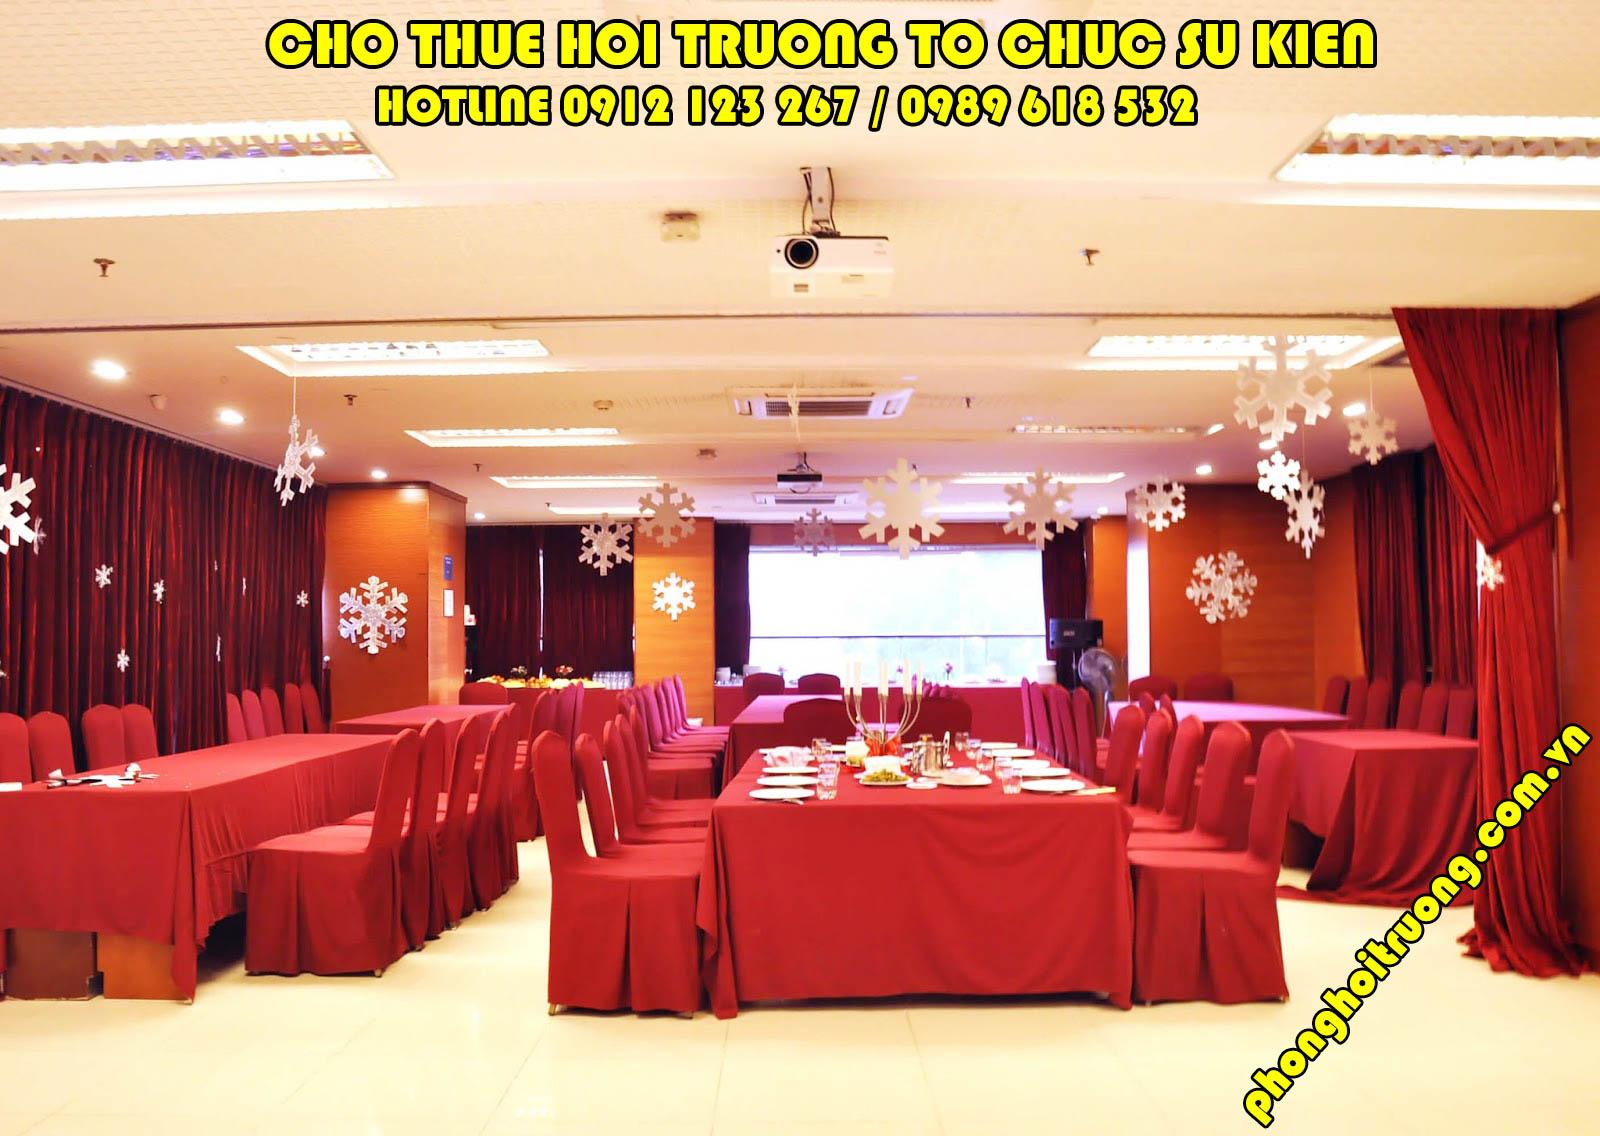 cho-thue-hoi-truong-to-chuc-su-kien-noel